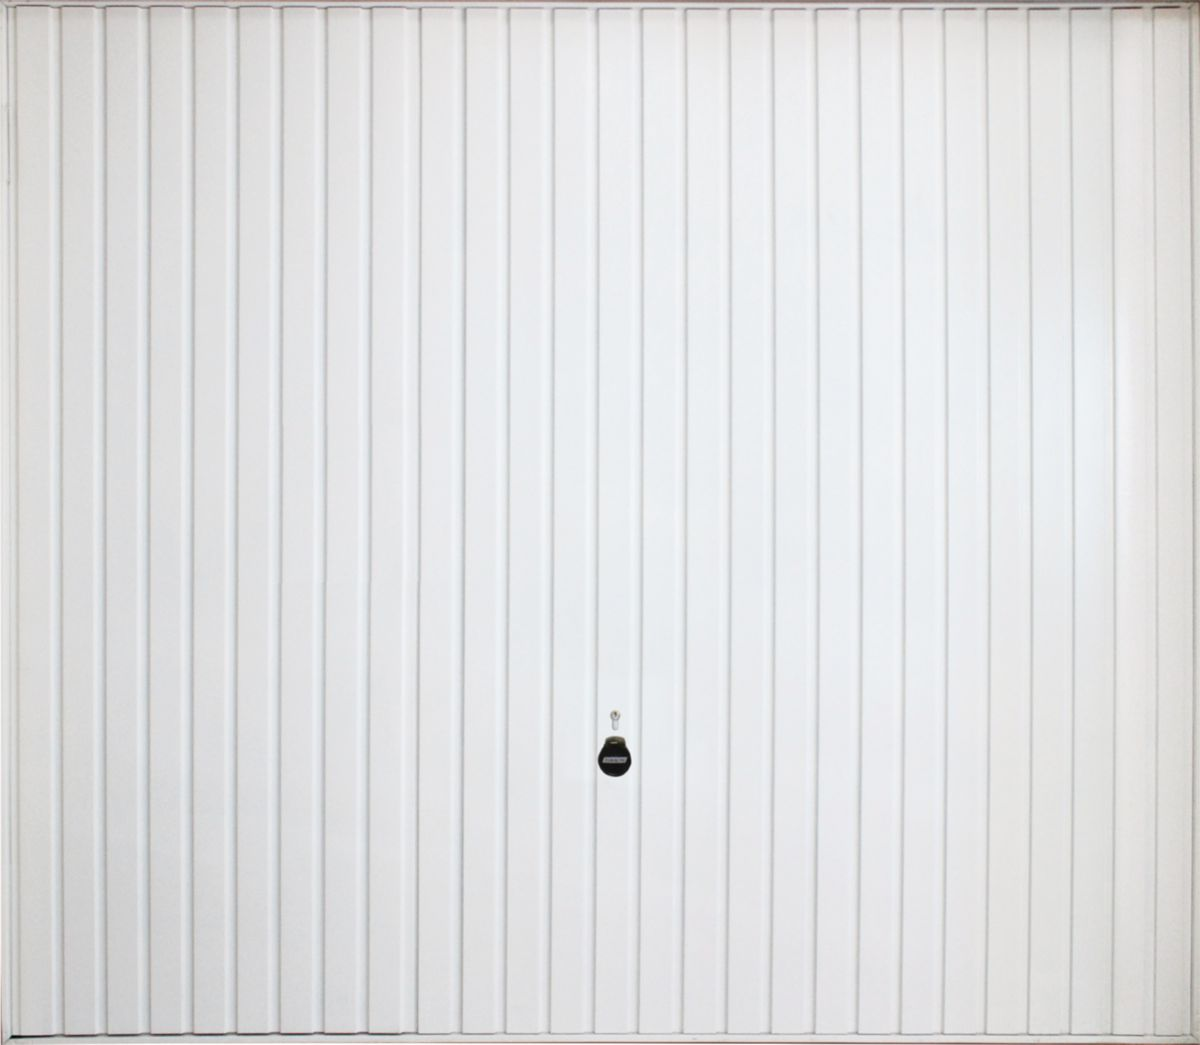 Tubauto distribution sas porte garage basculante d bordante 124 acier nervures vert blanc rail - Porte de garage basculante non debordante tubauto ...